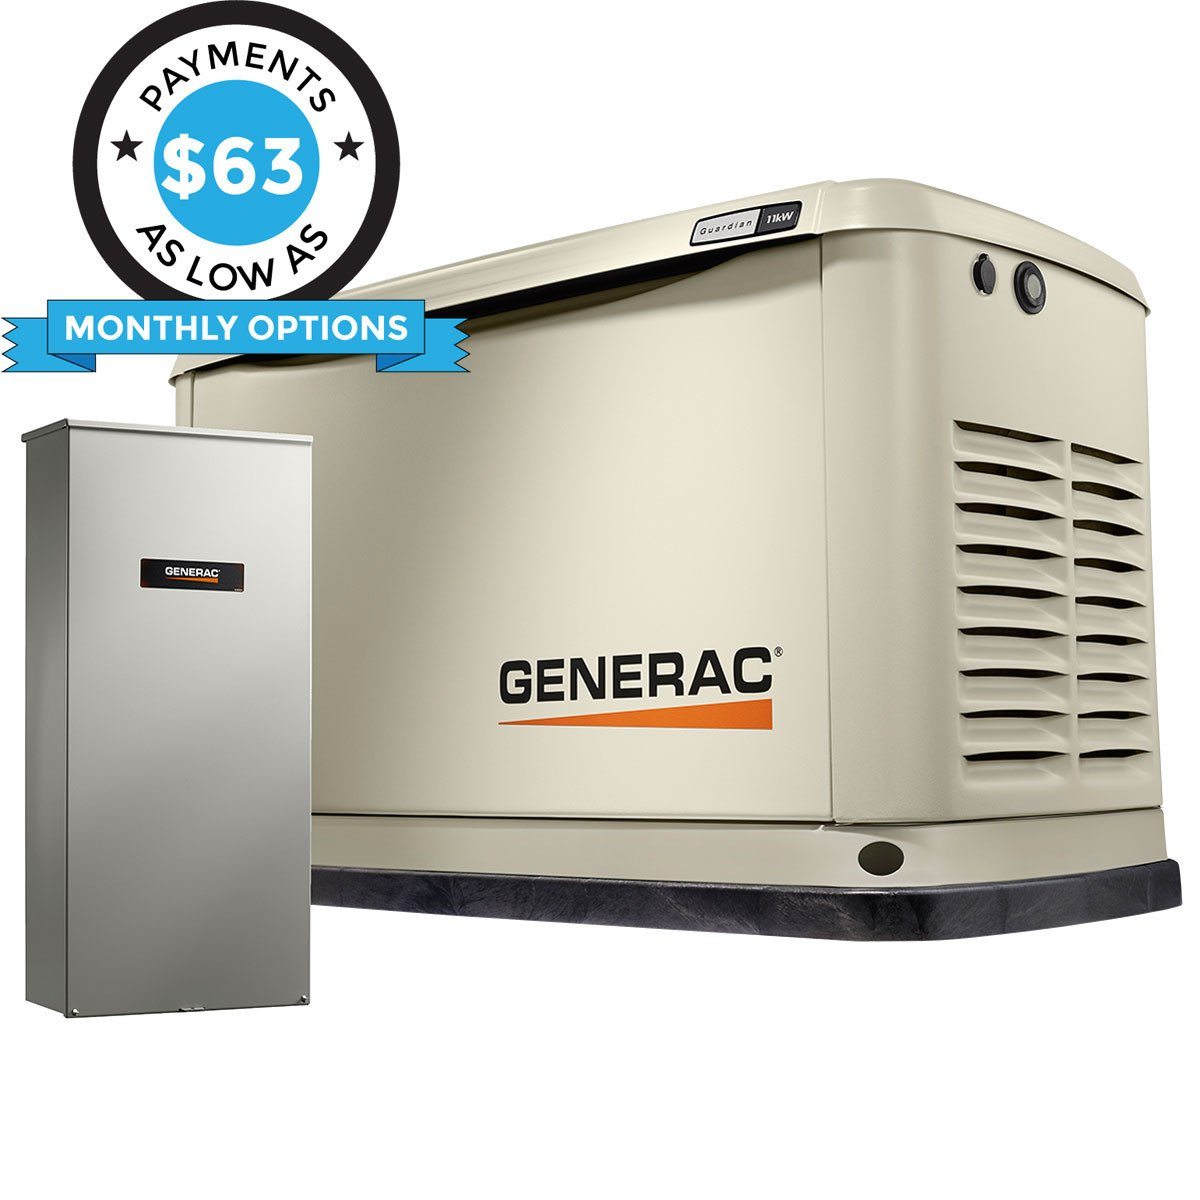 Remarkable Generac Guardian 7033 11Kw Aluminum Automatic Standby Generator With Wiring Cloud Loplapiotaidewilluminateatxorg